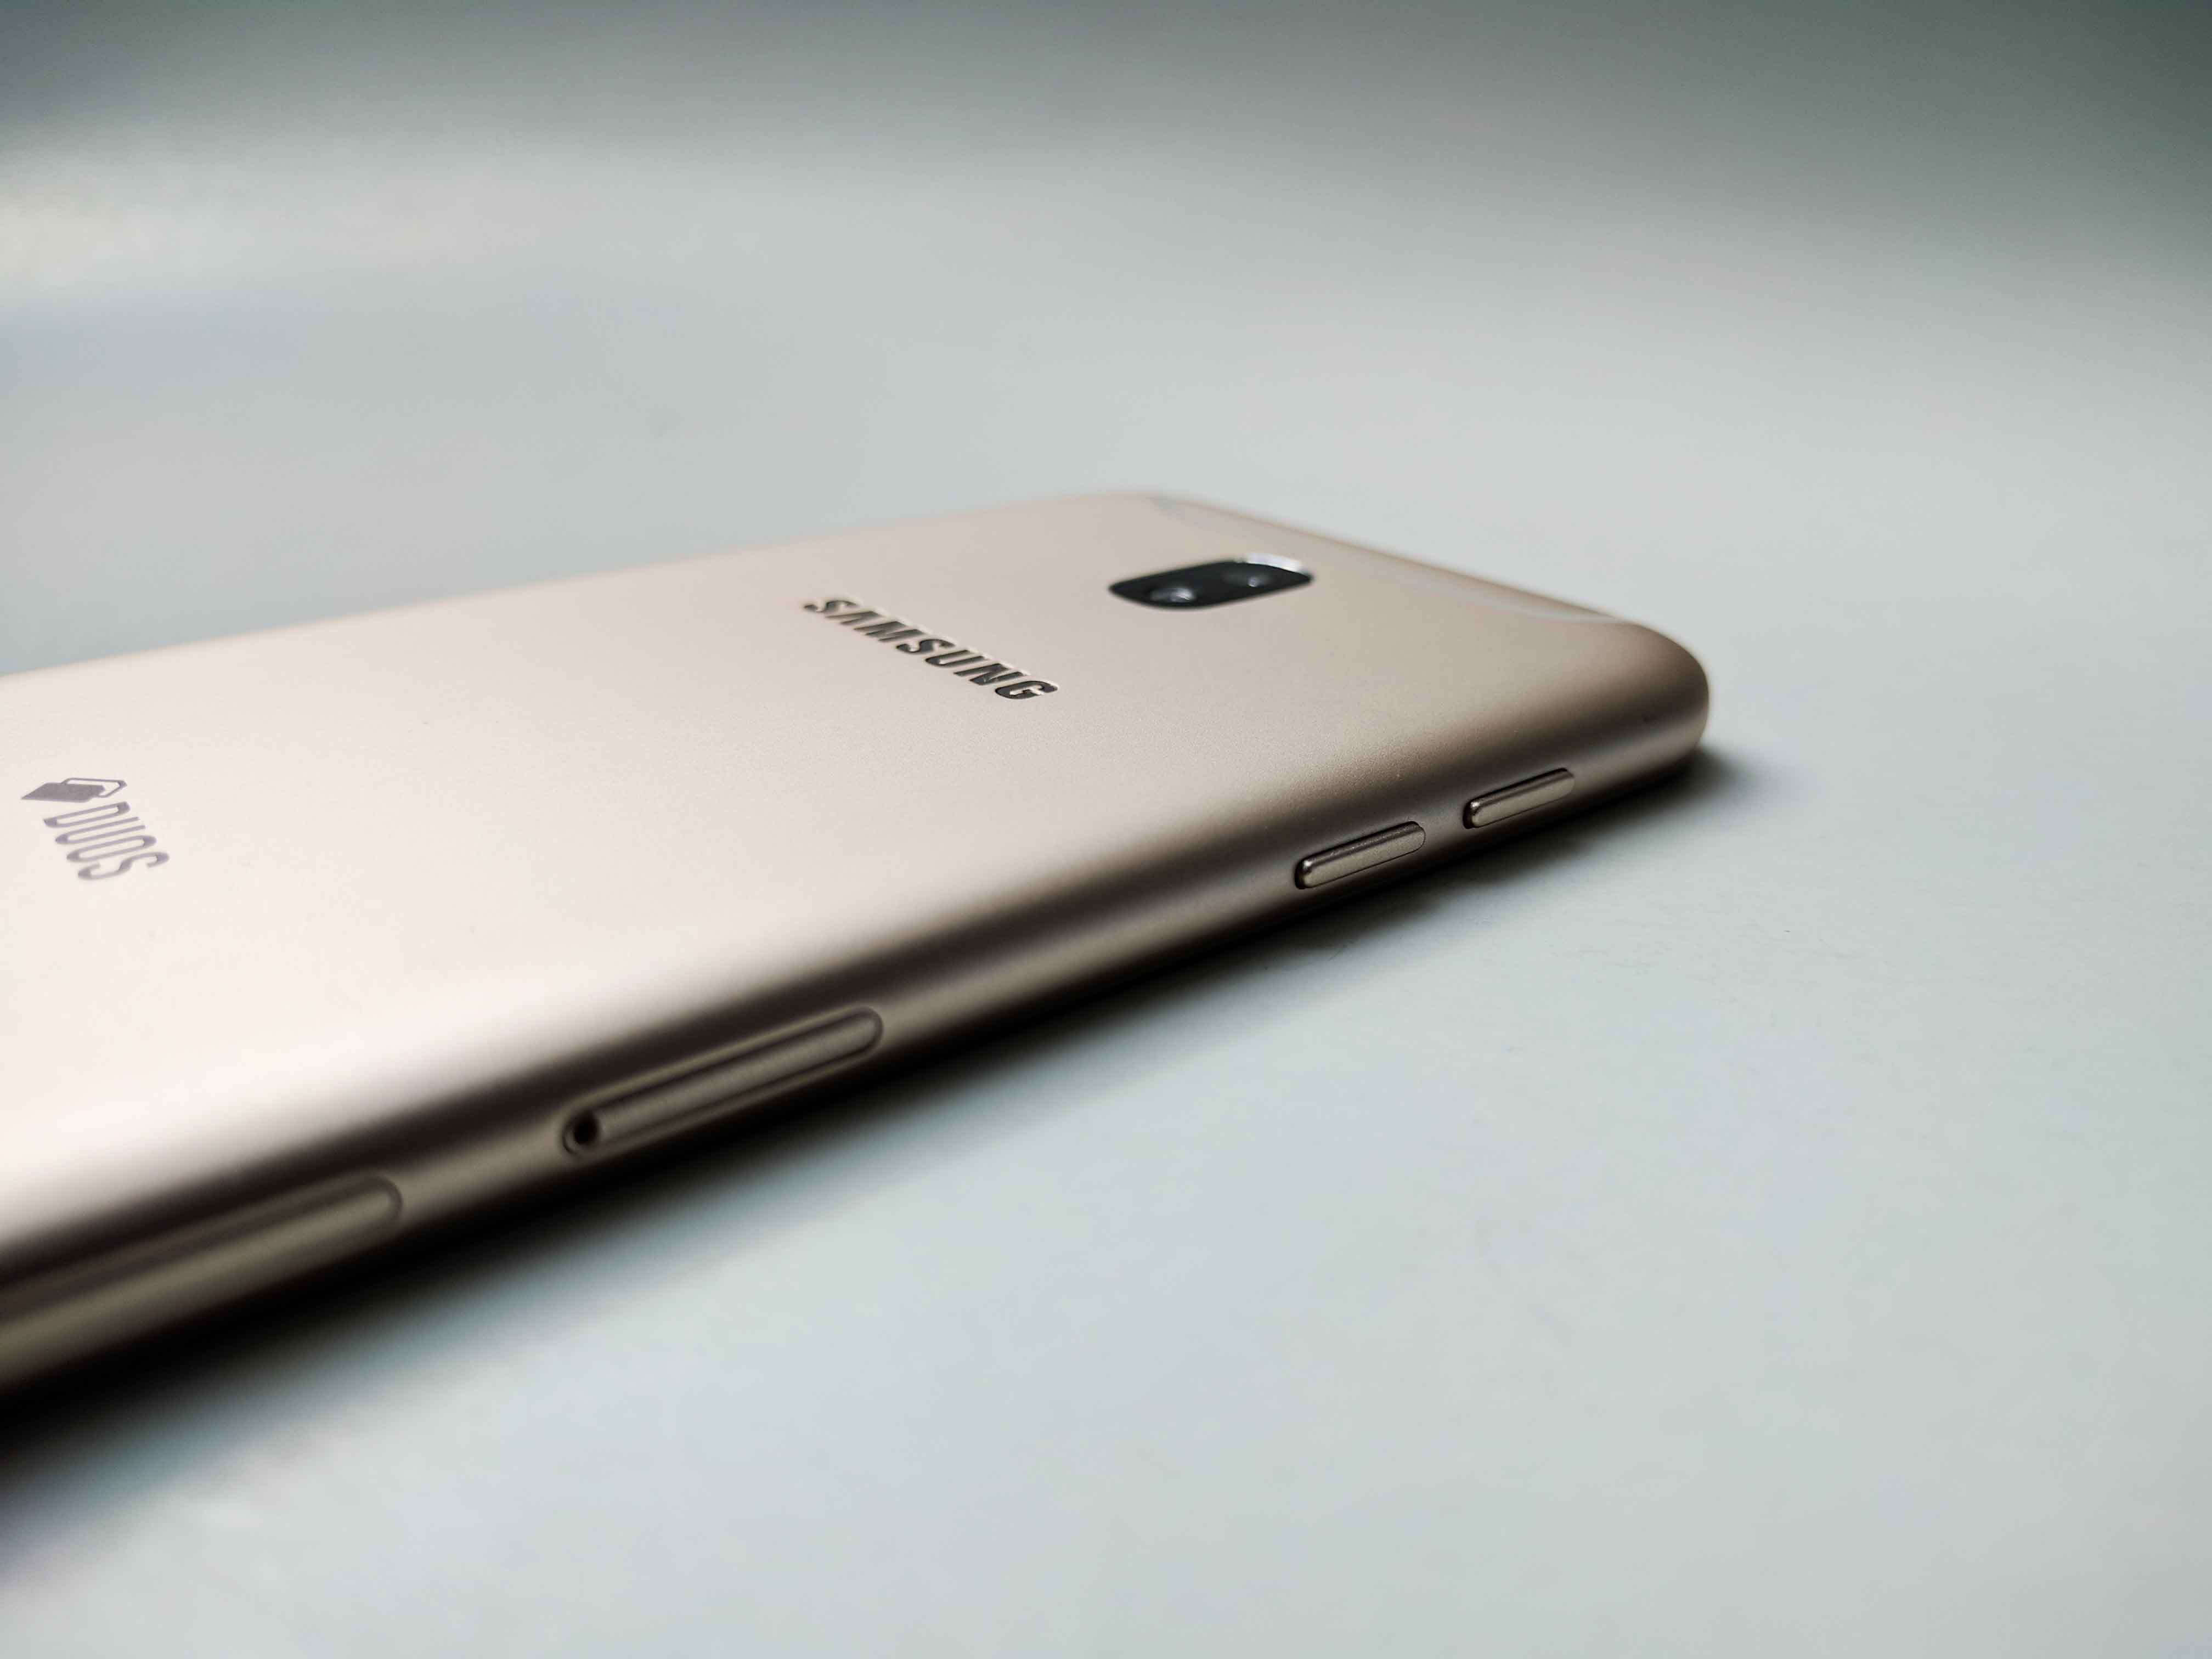 Samsung Galaxy J5 (2017) Review Romana, Pareri - foto 6